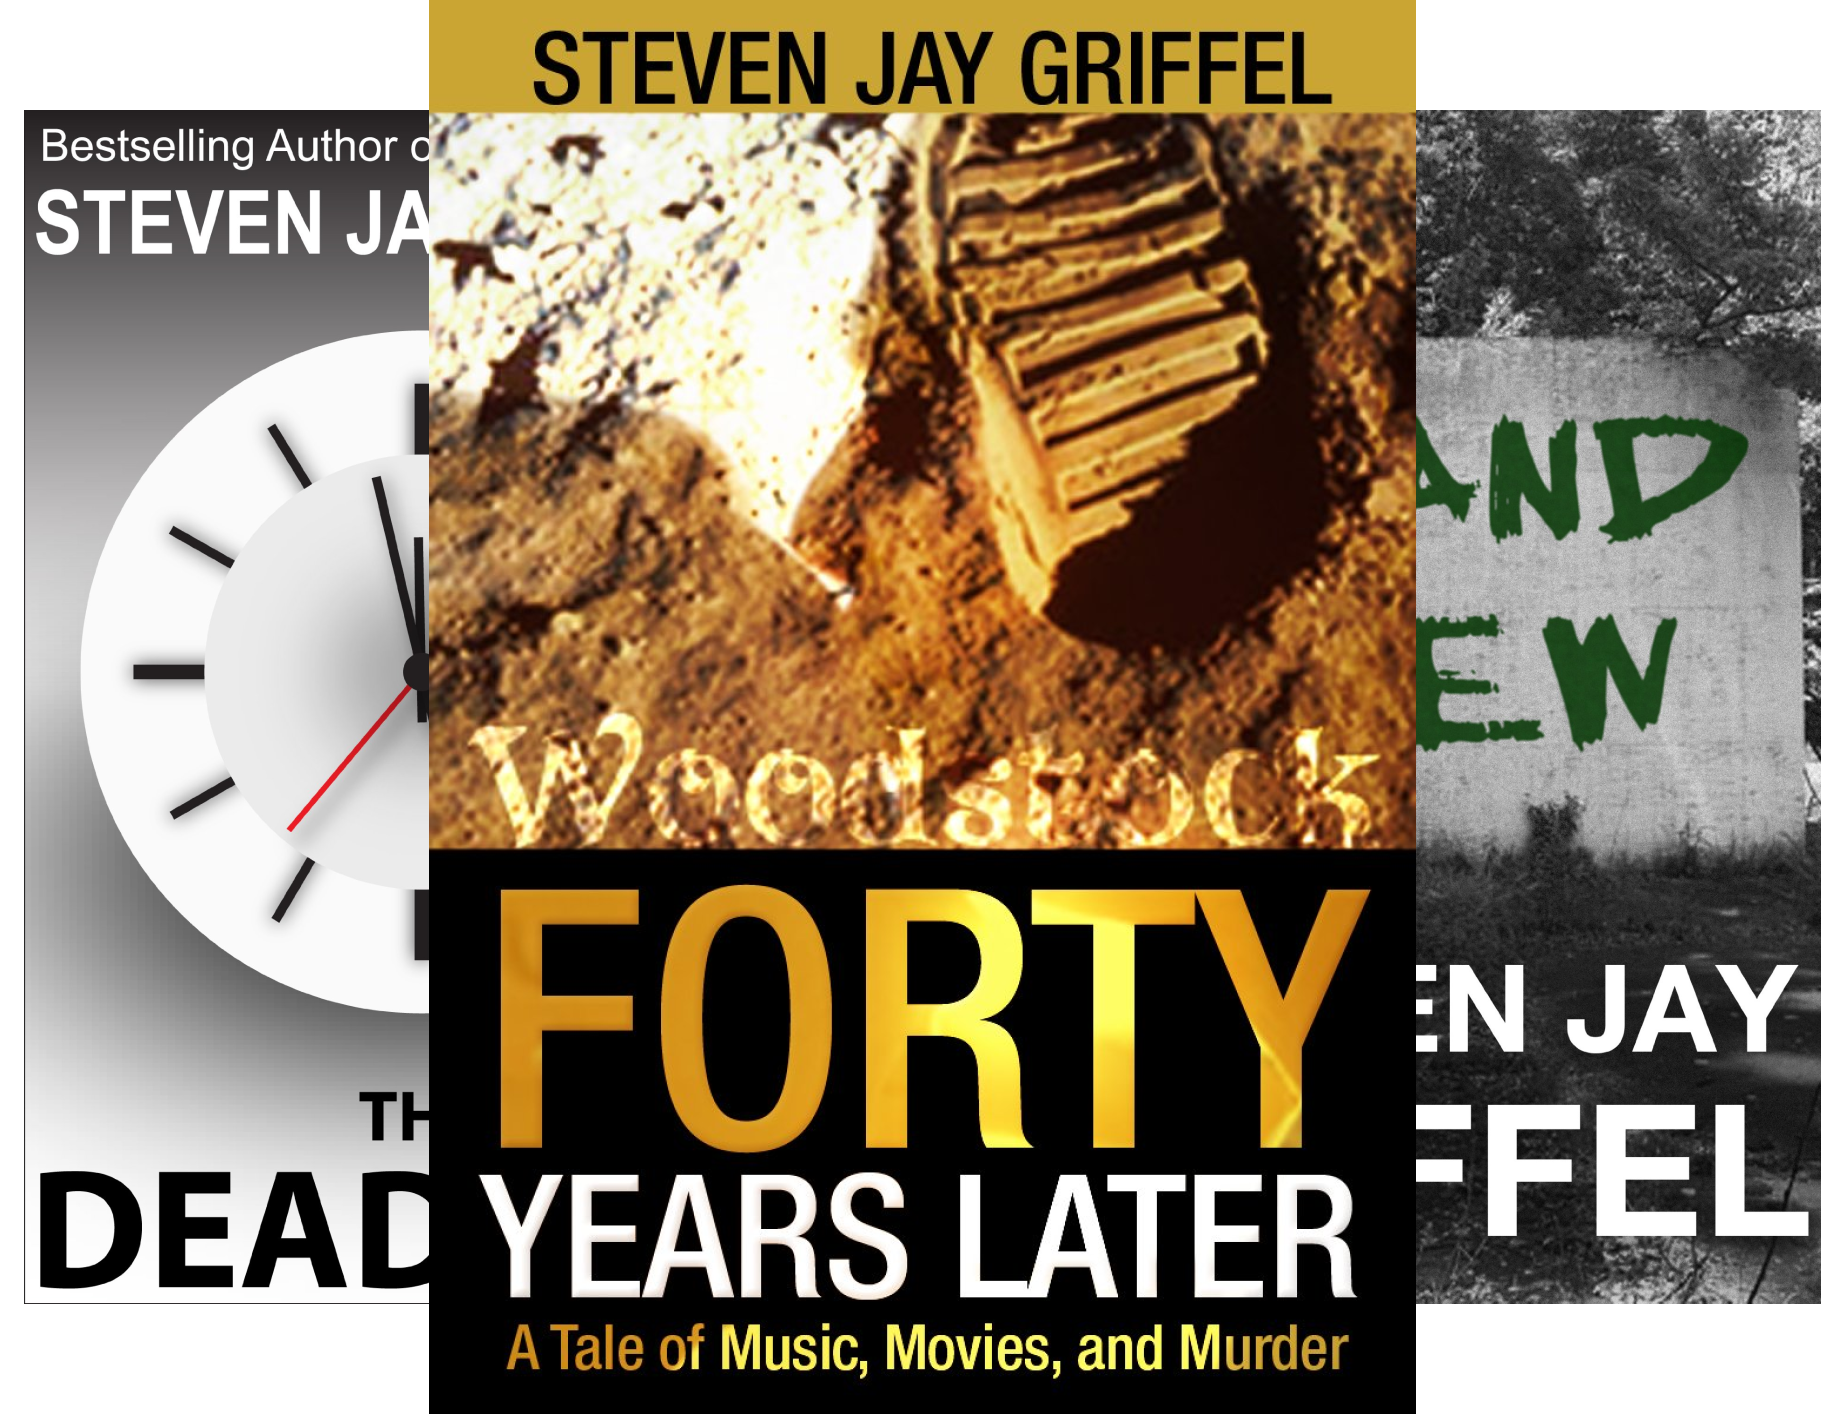 David Grossman Series (5 Book Series)